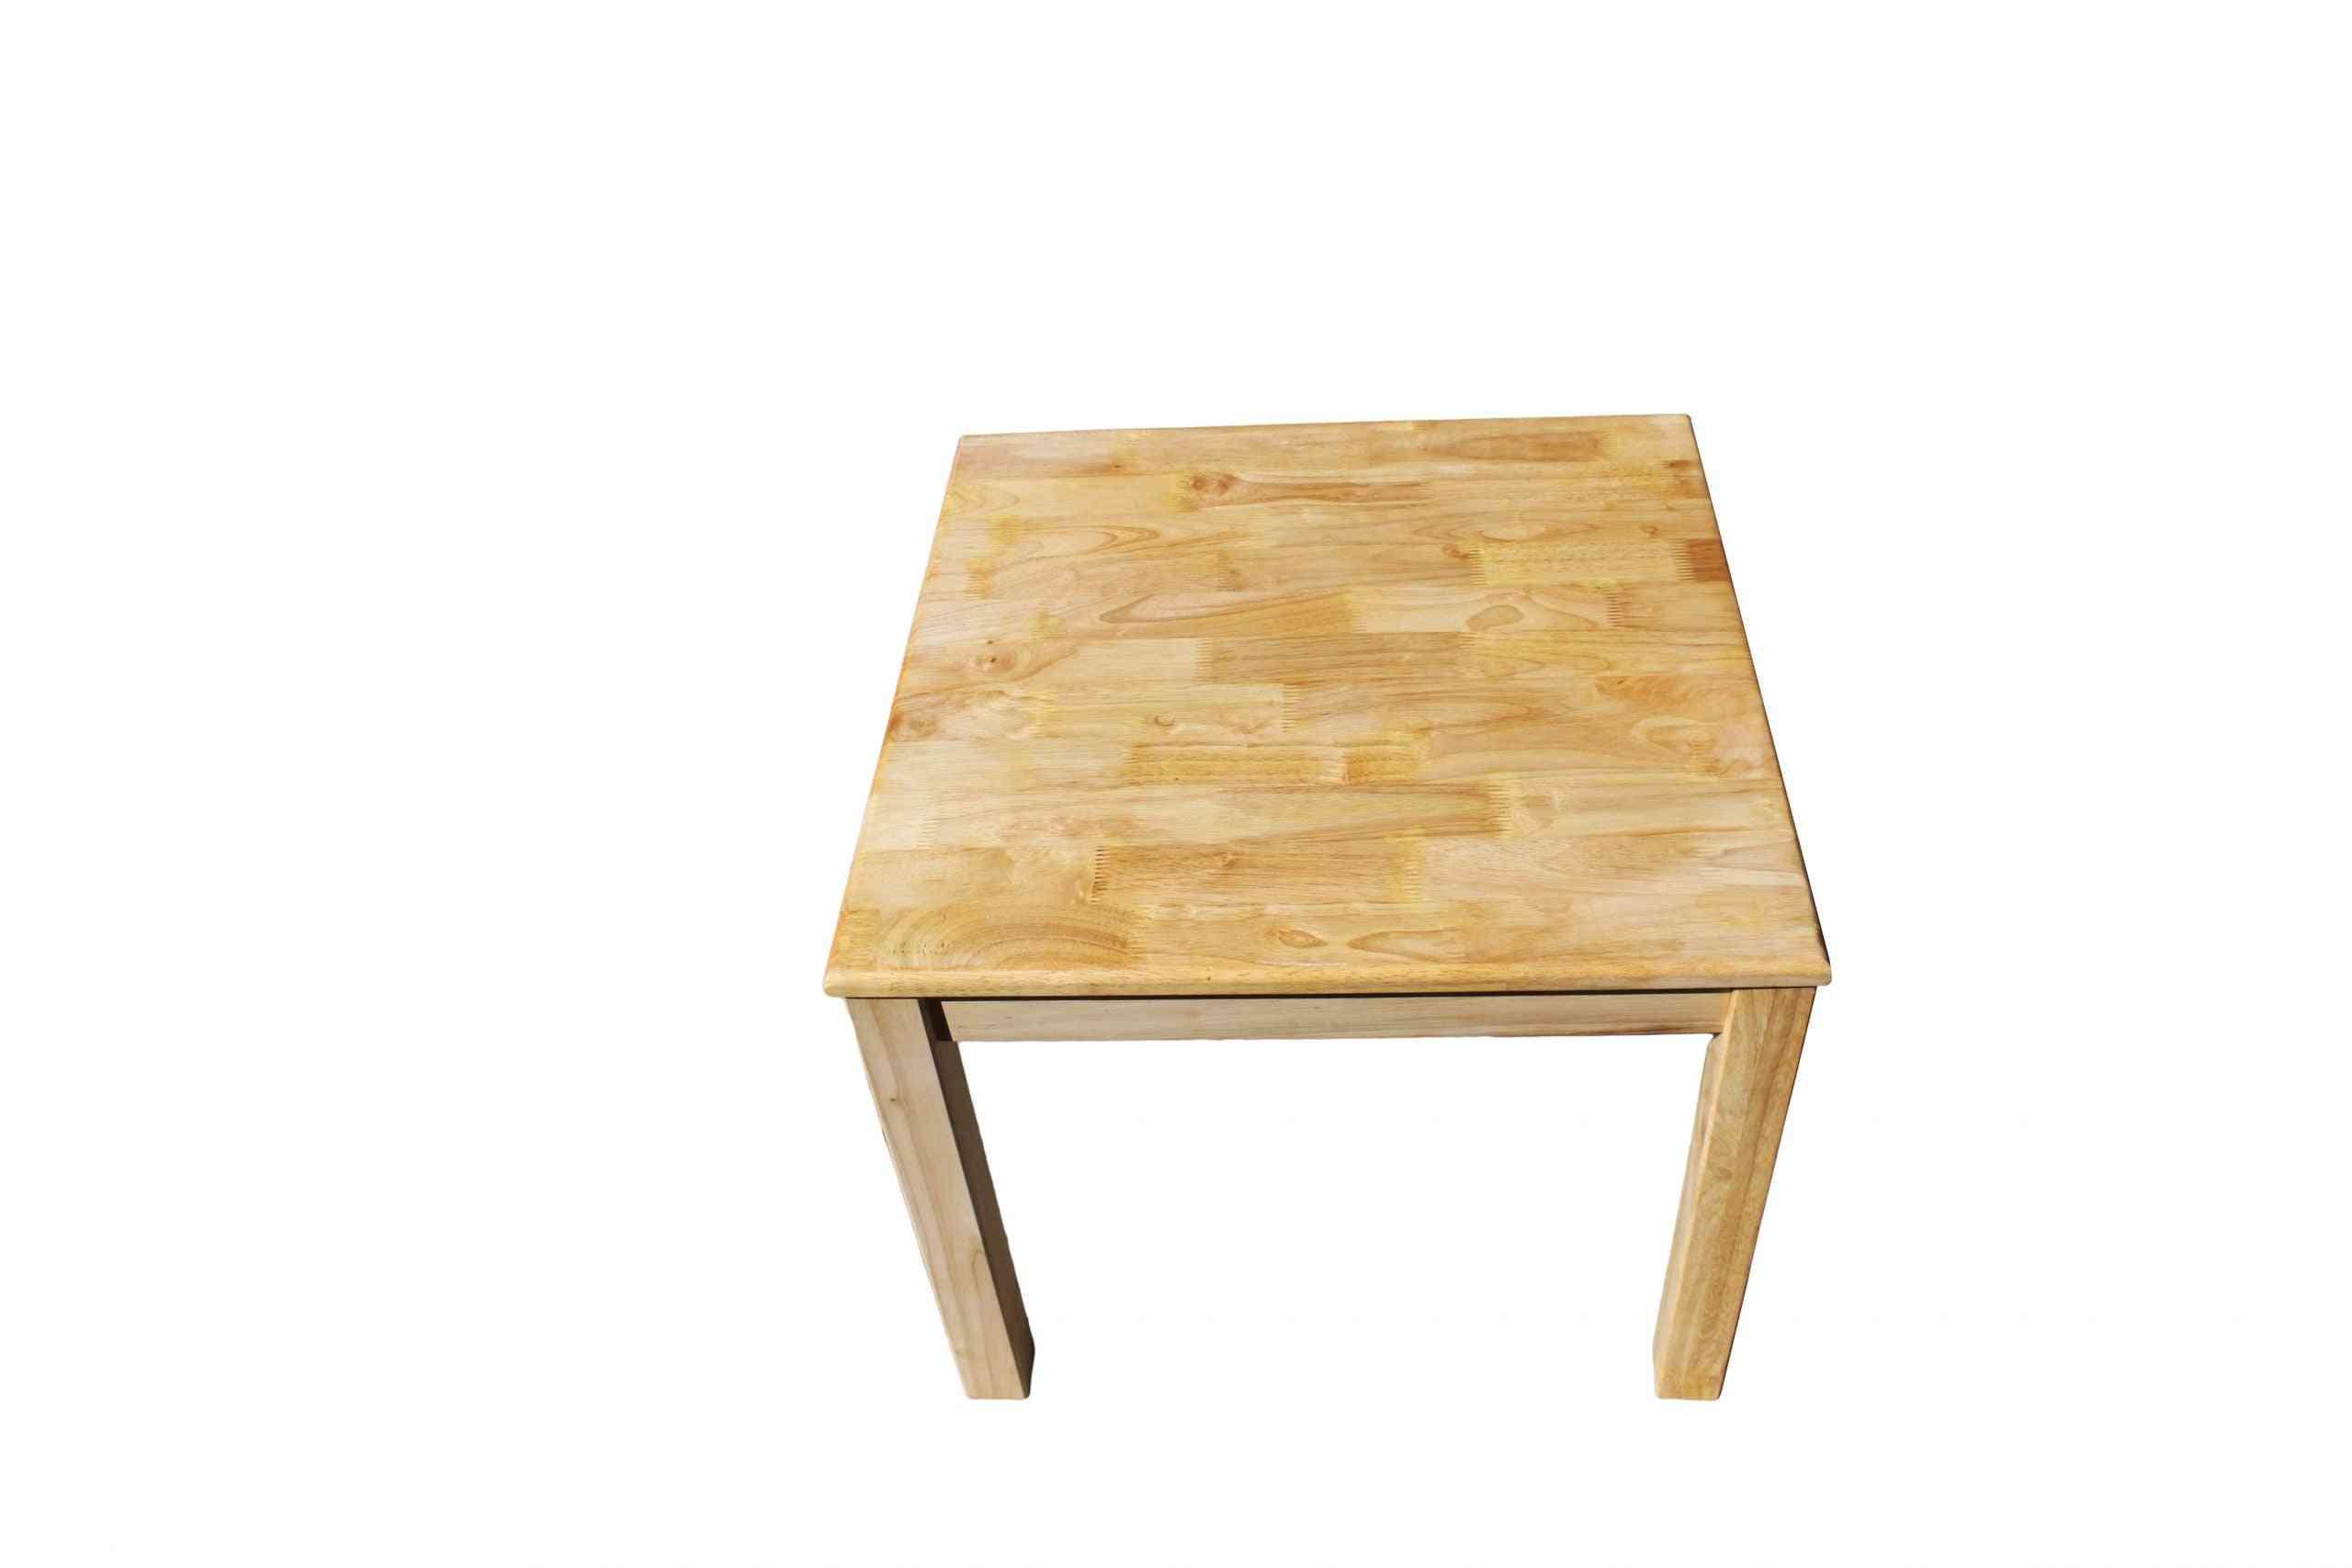 Qtoys Australia (usa) Standard Rubberwood Table